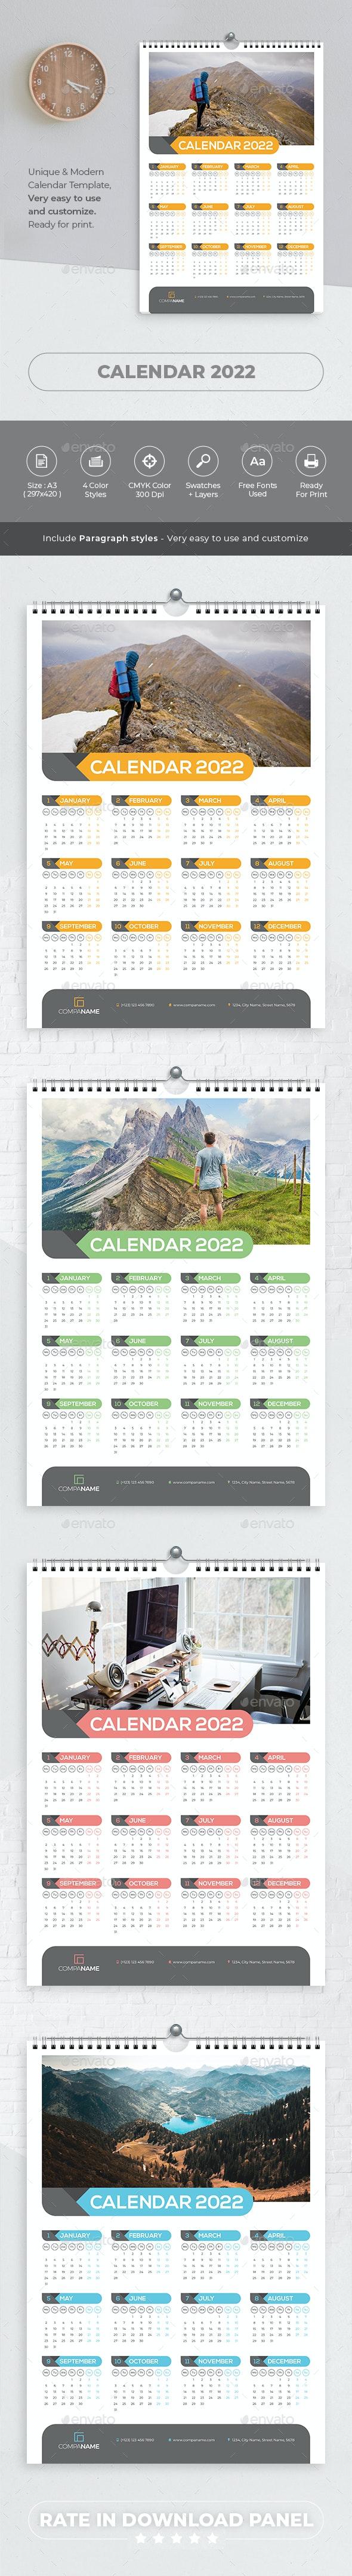 Wall Calendar 2022 - Calendars Stationery